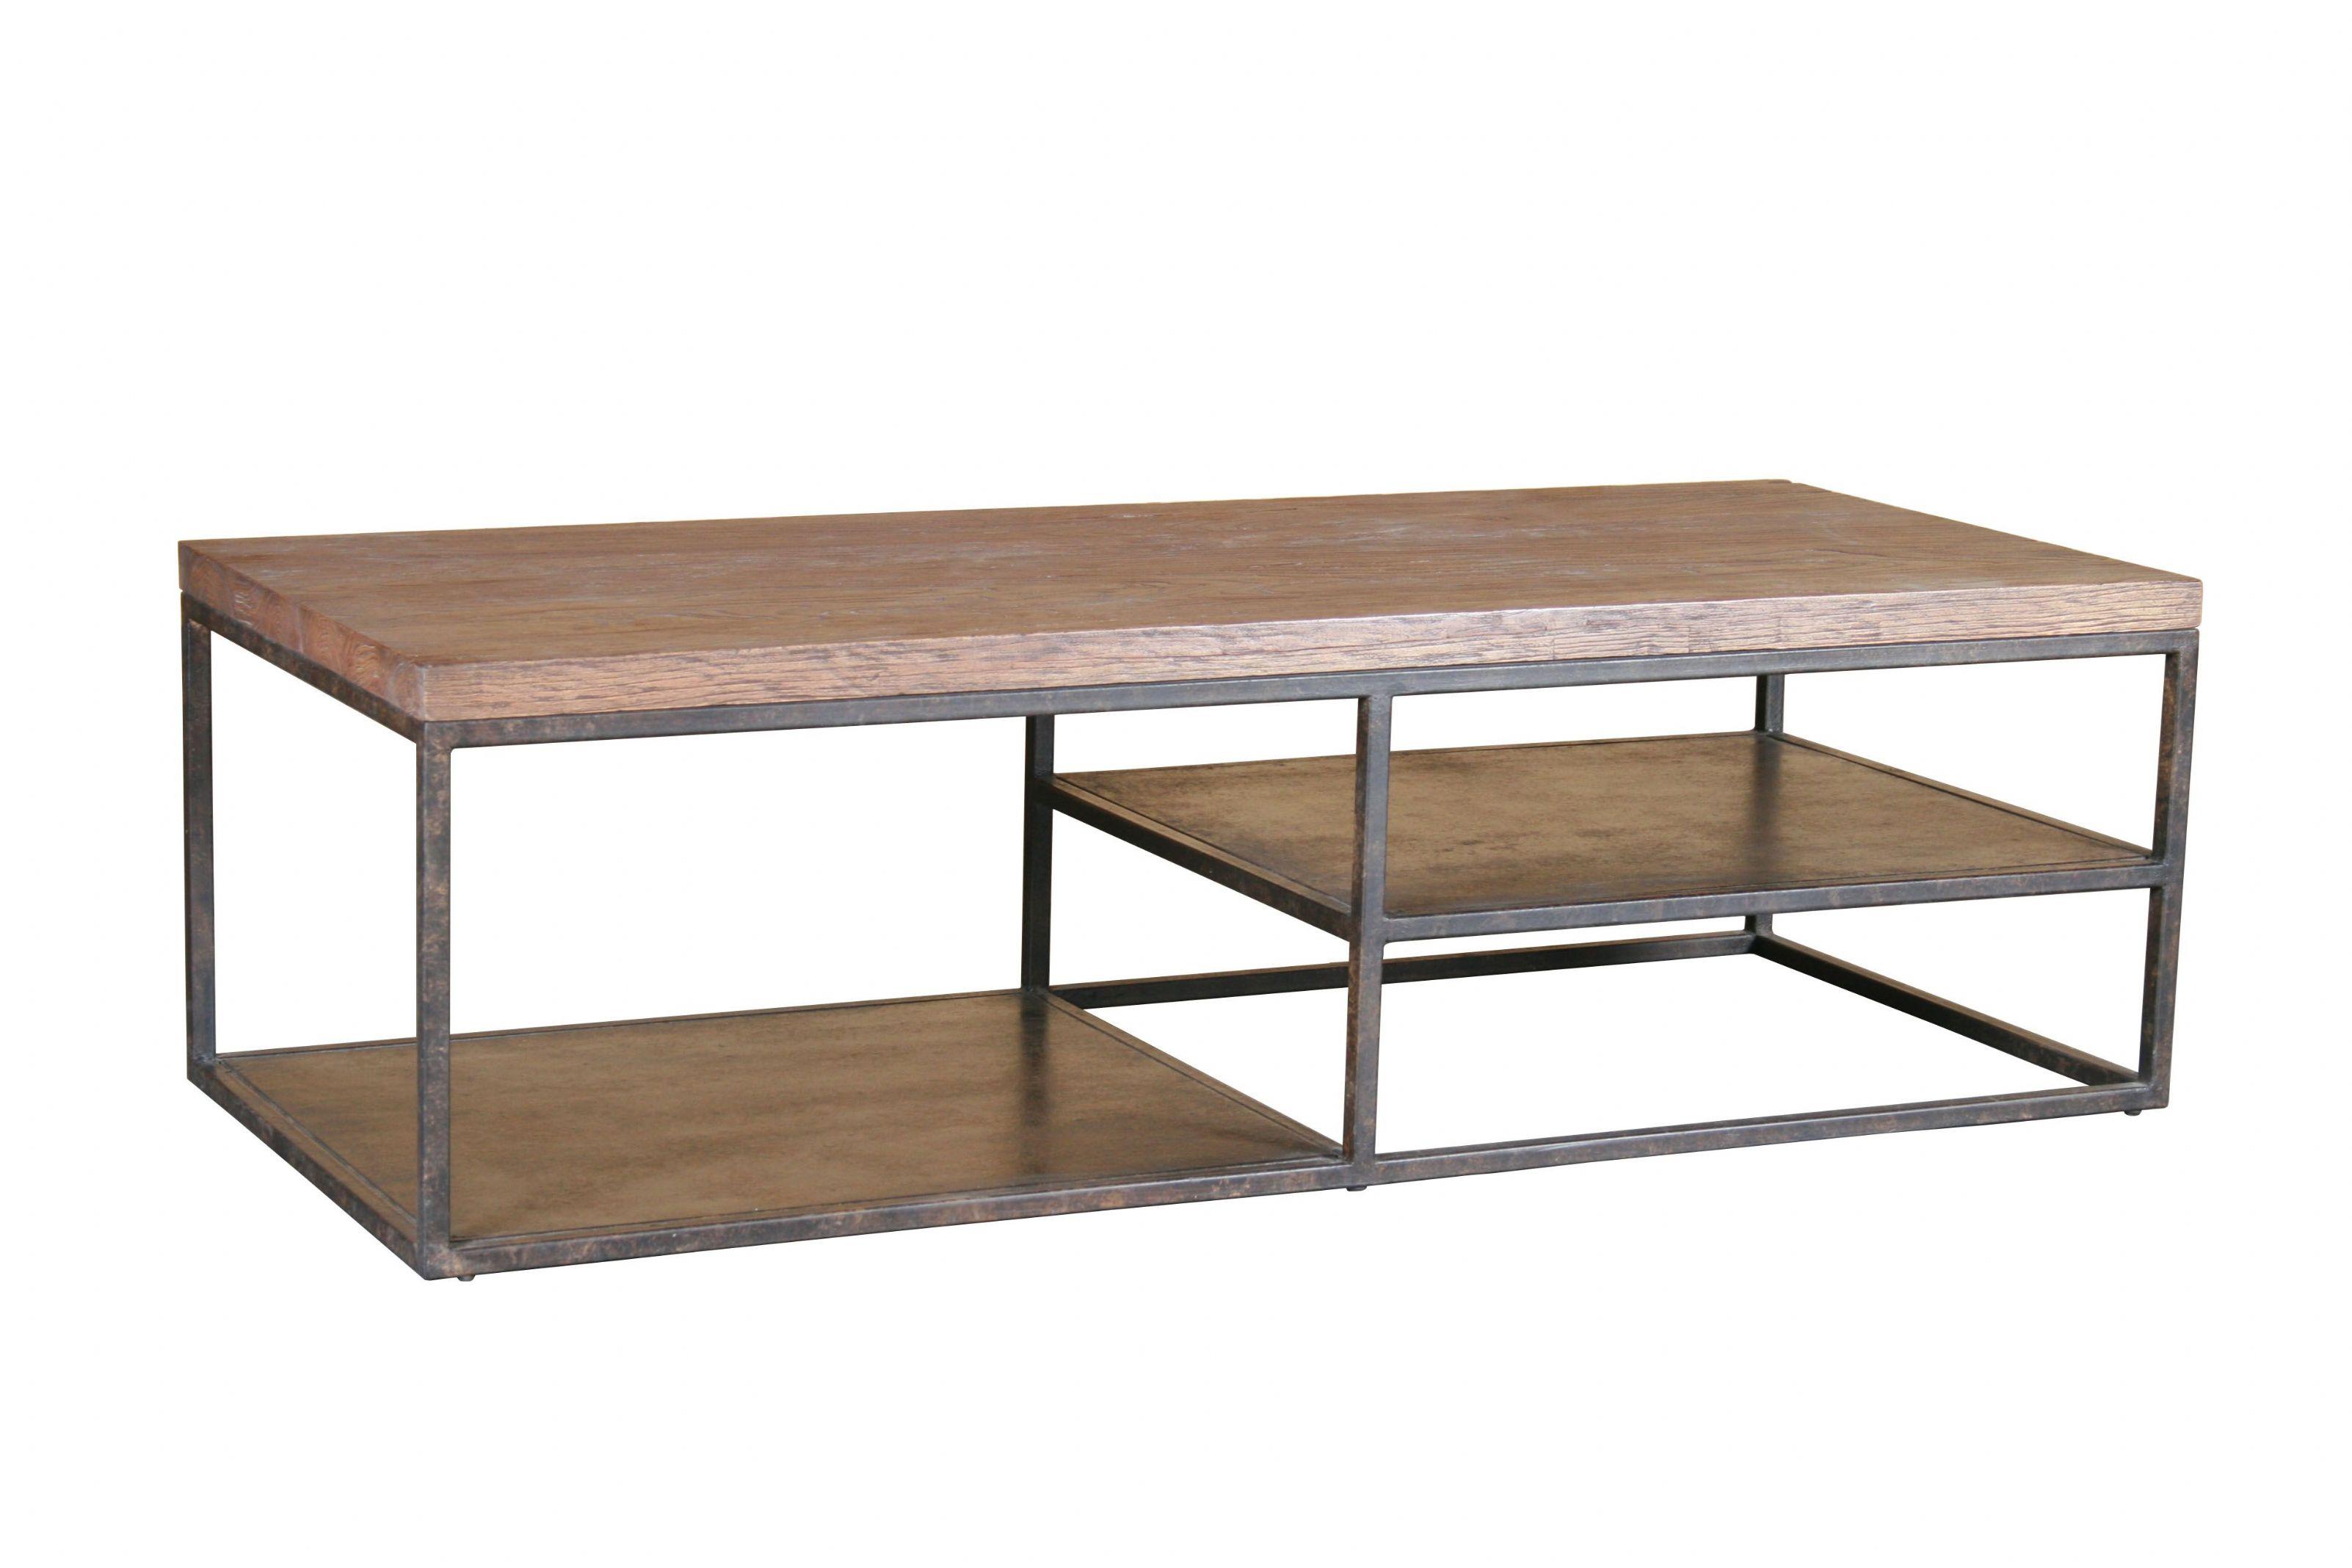 metal coffee table design photo - 6